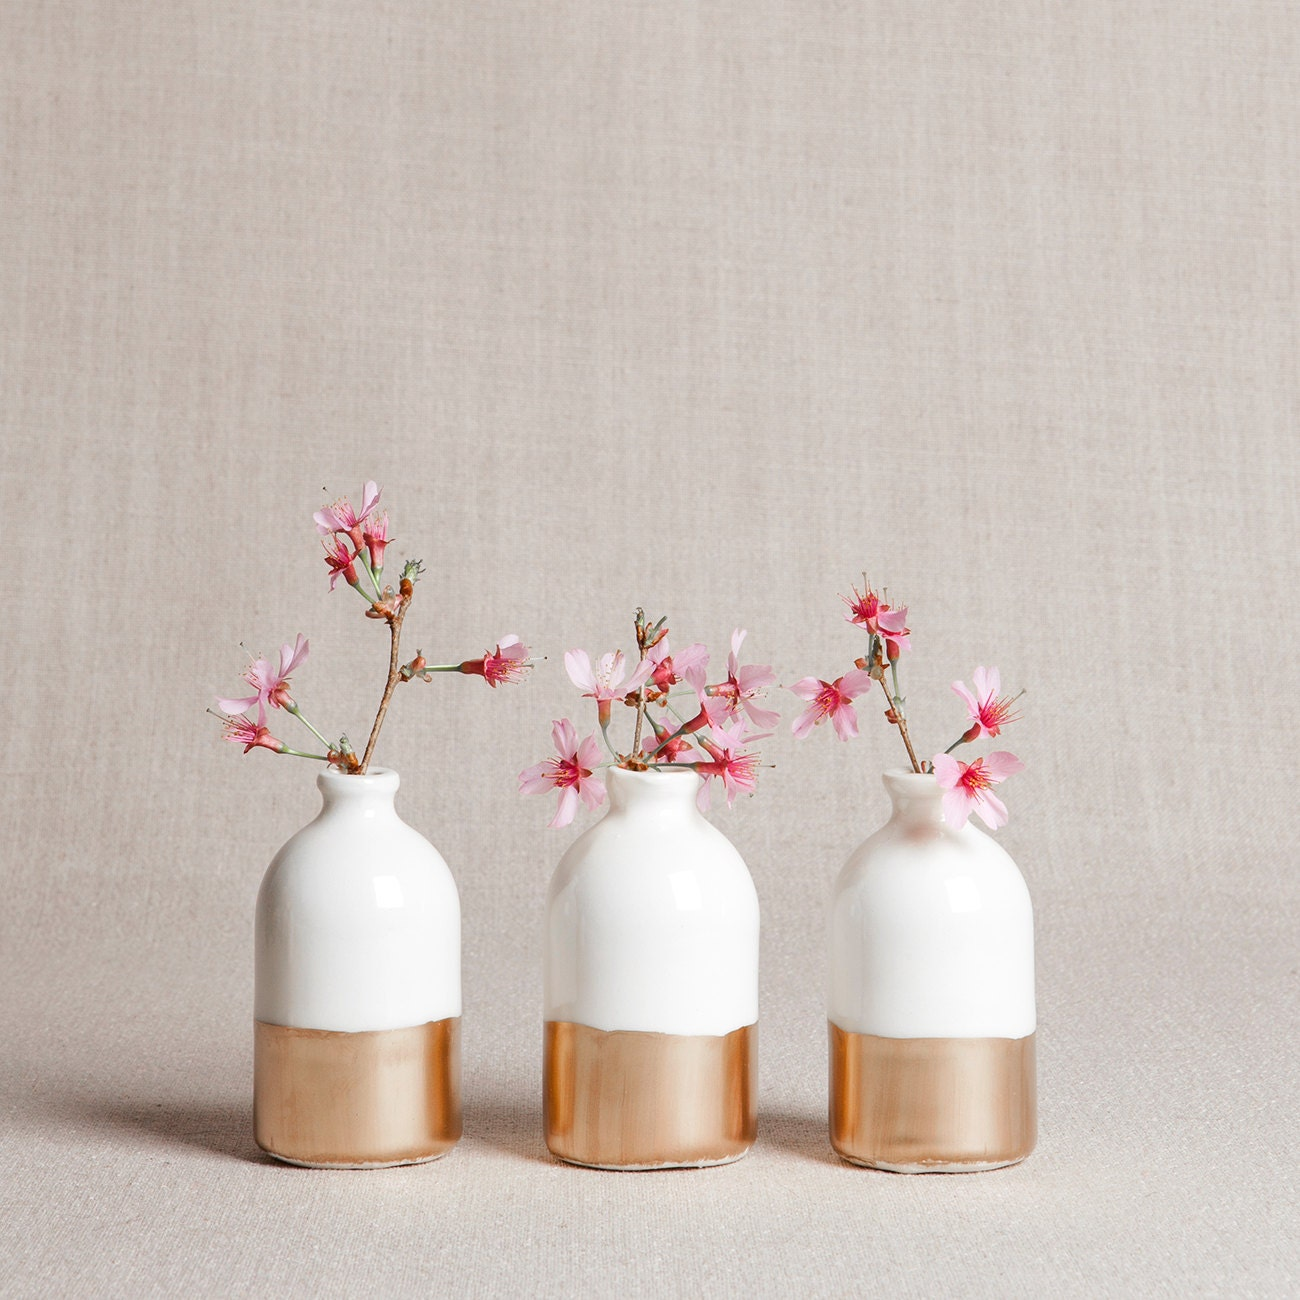 Ready to ship white minimalist bud vases set of three ready to ship white gold minimalist bud vases set of three reviewsmspy